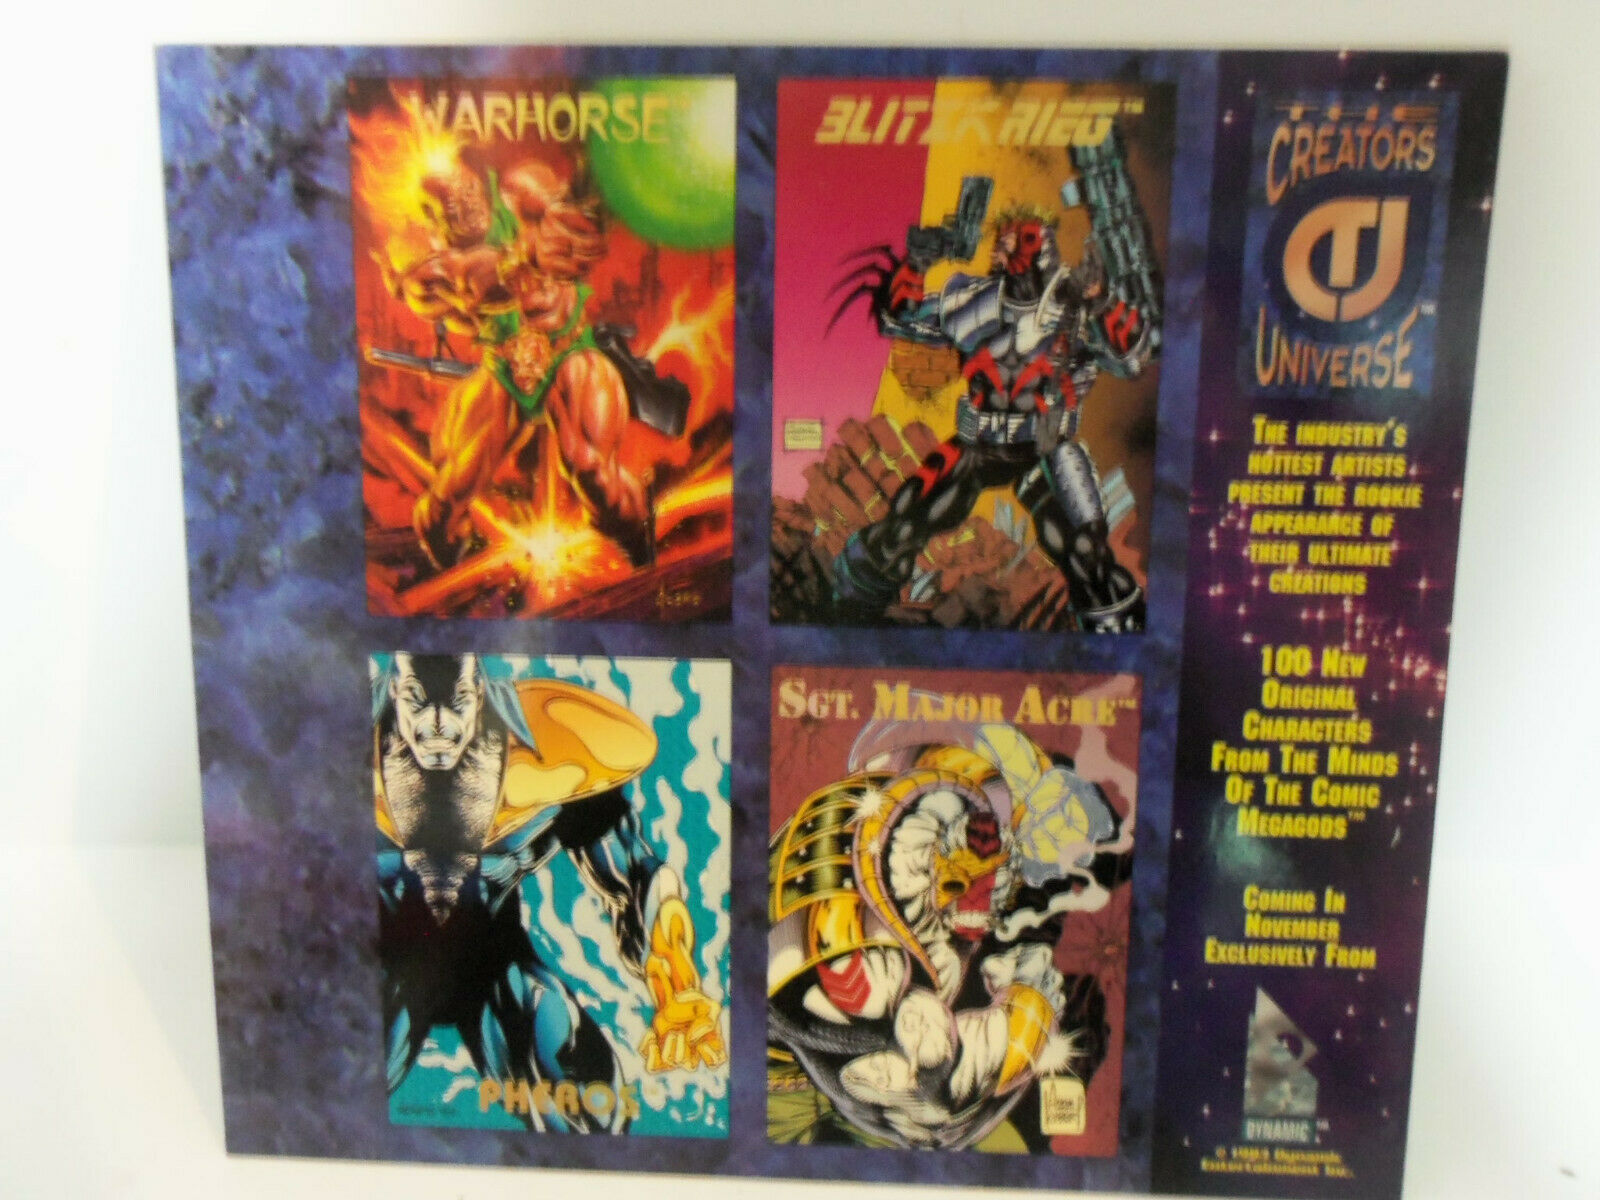 Vintage 1993 CREATOR'S UNIVERSE Uncut PROMO Cards Sheet Kubert Jusko Sears Nguye image 6